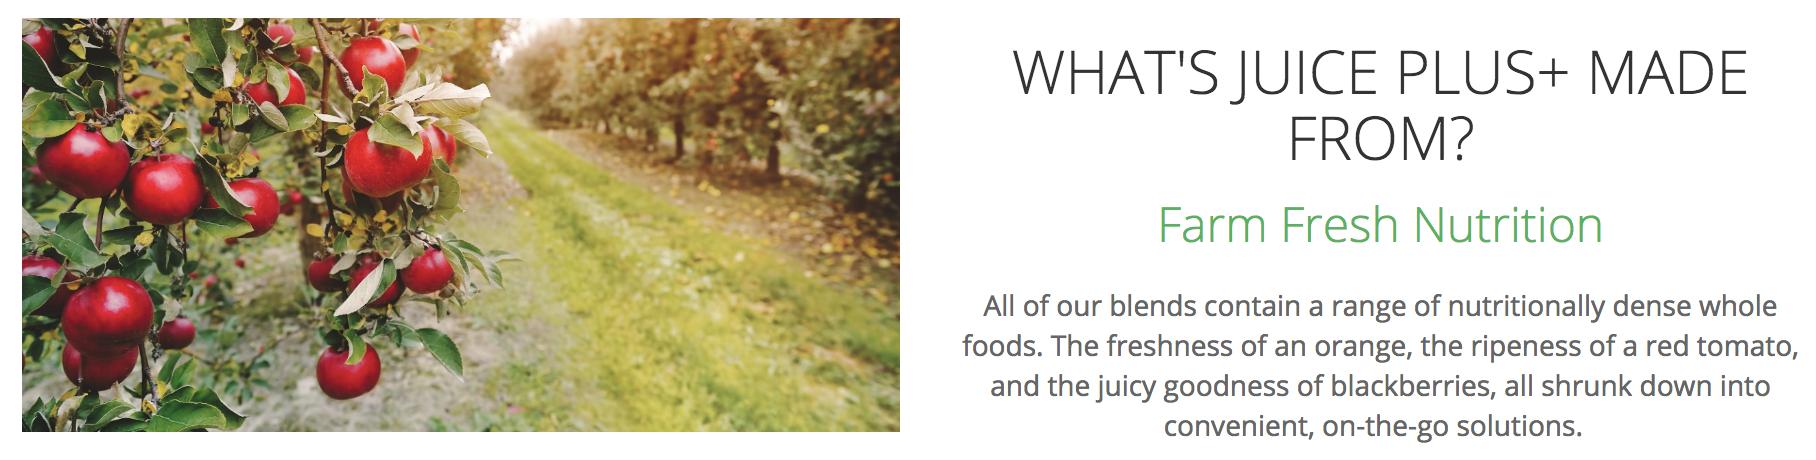 screenshot from the Juice Plus+ website